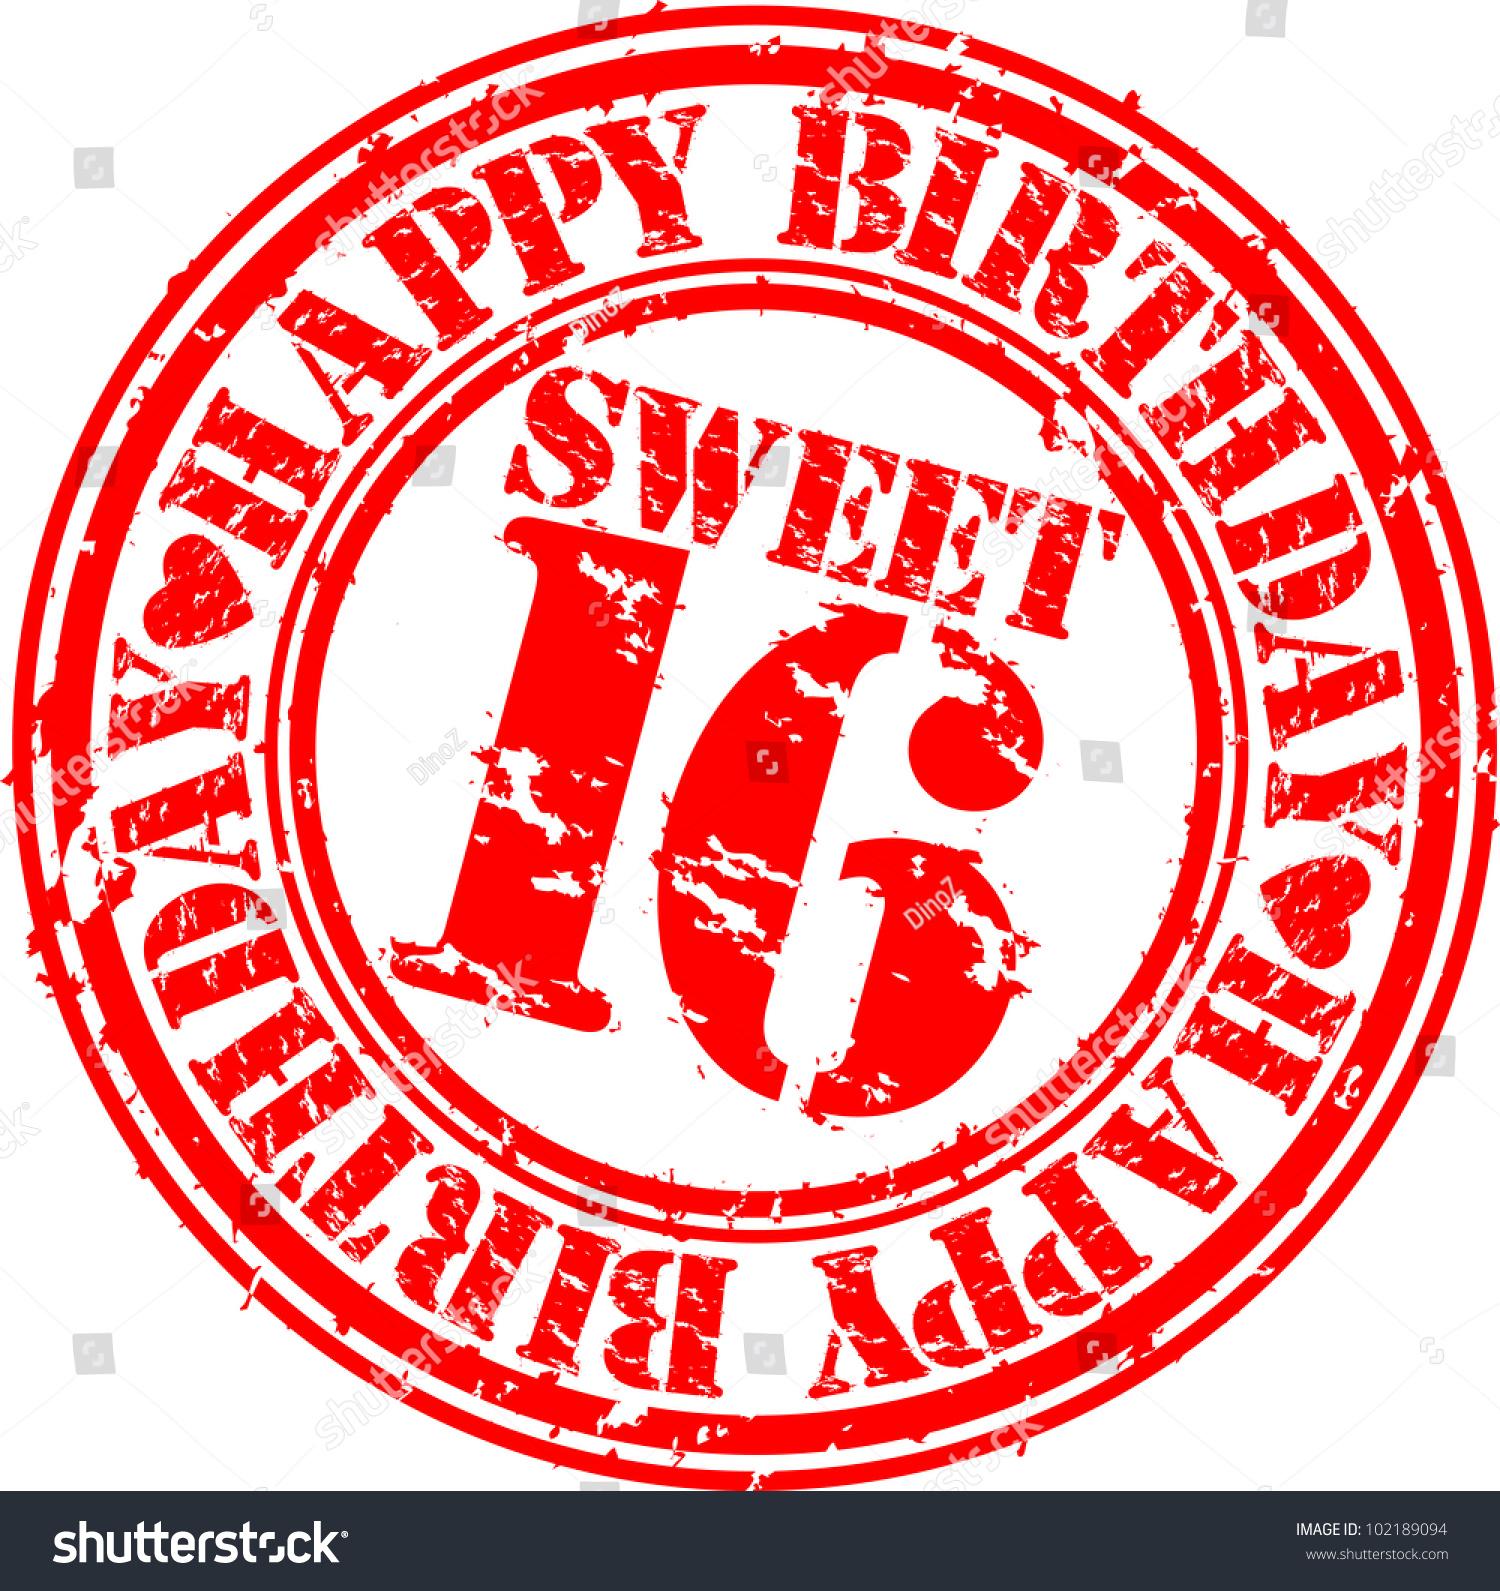 Grunge Happy Birthday Sweet 16 Rubber Stock Vector 102189094 - Shutterstock